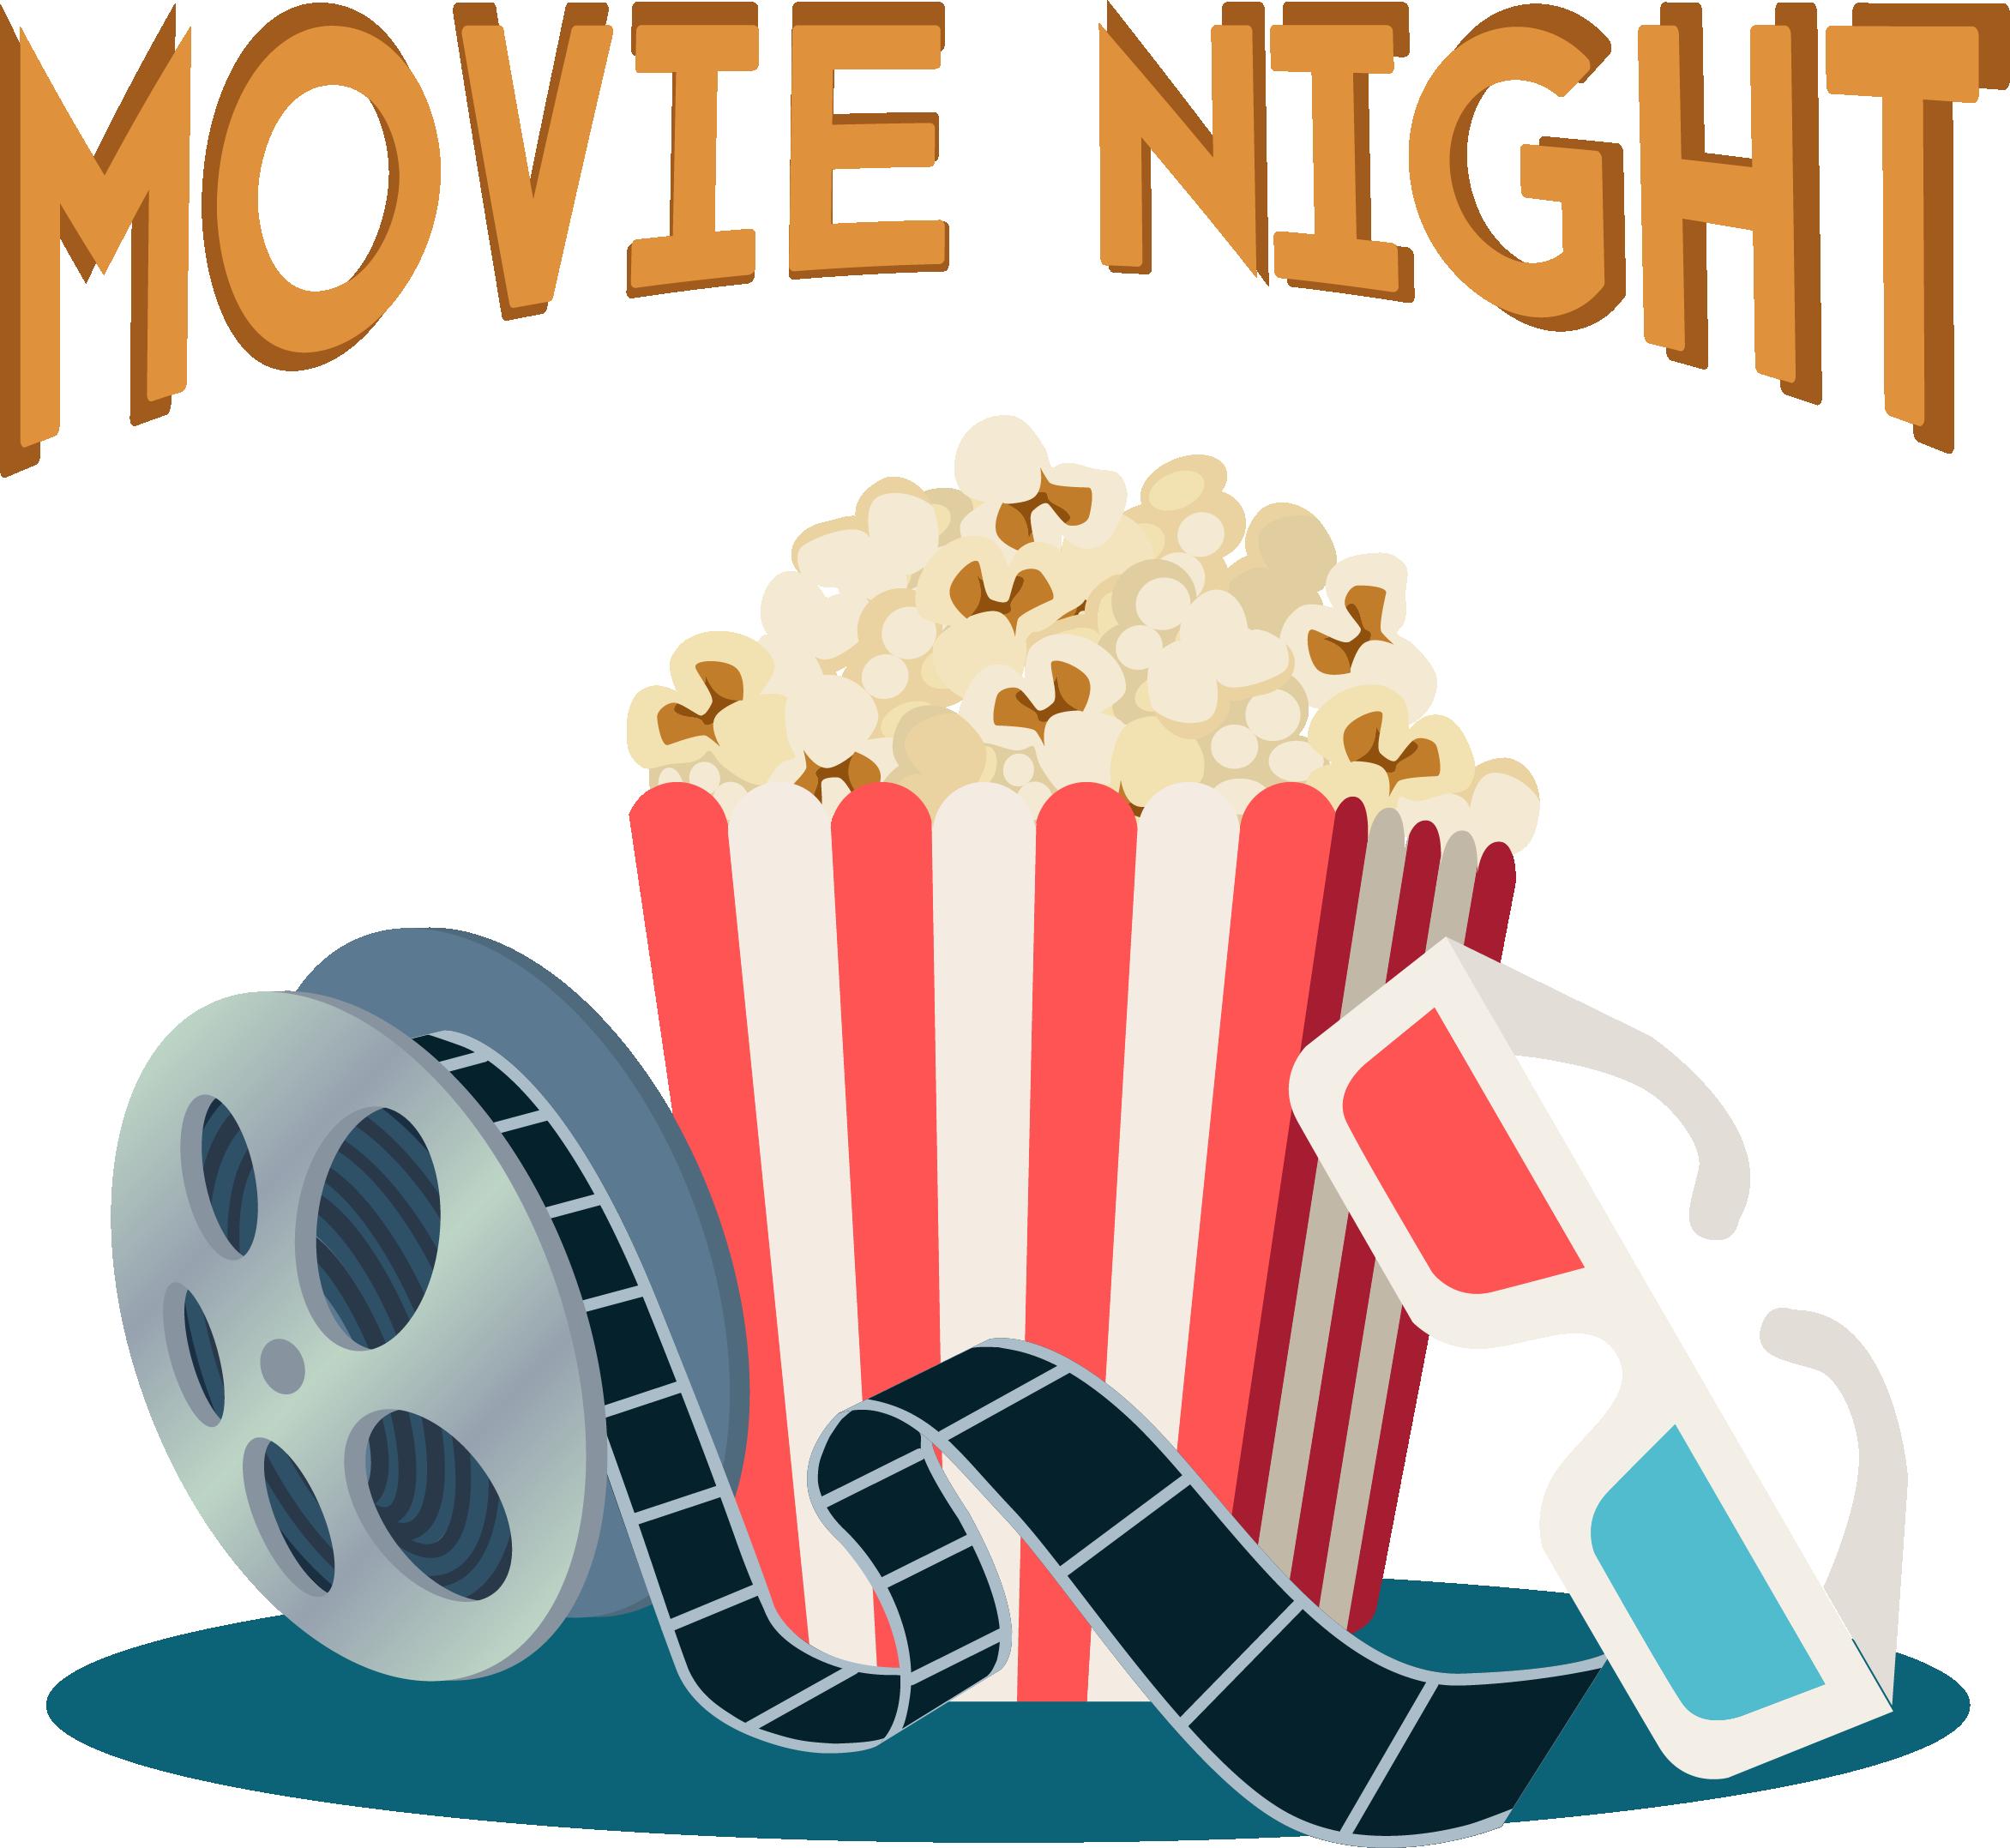 Film clipart movie night, Film movie night Transparent FREE.